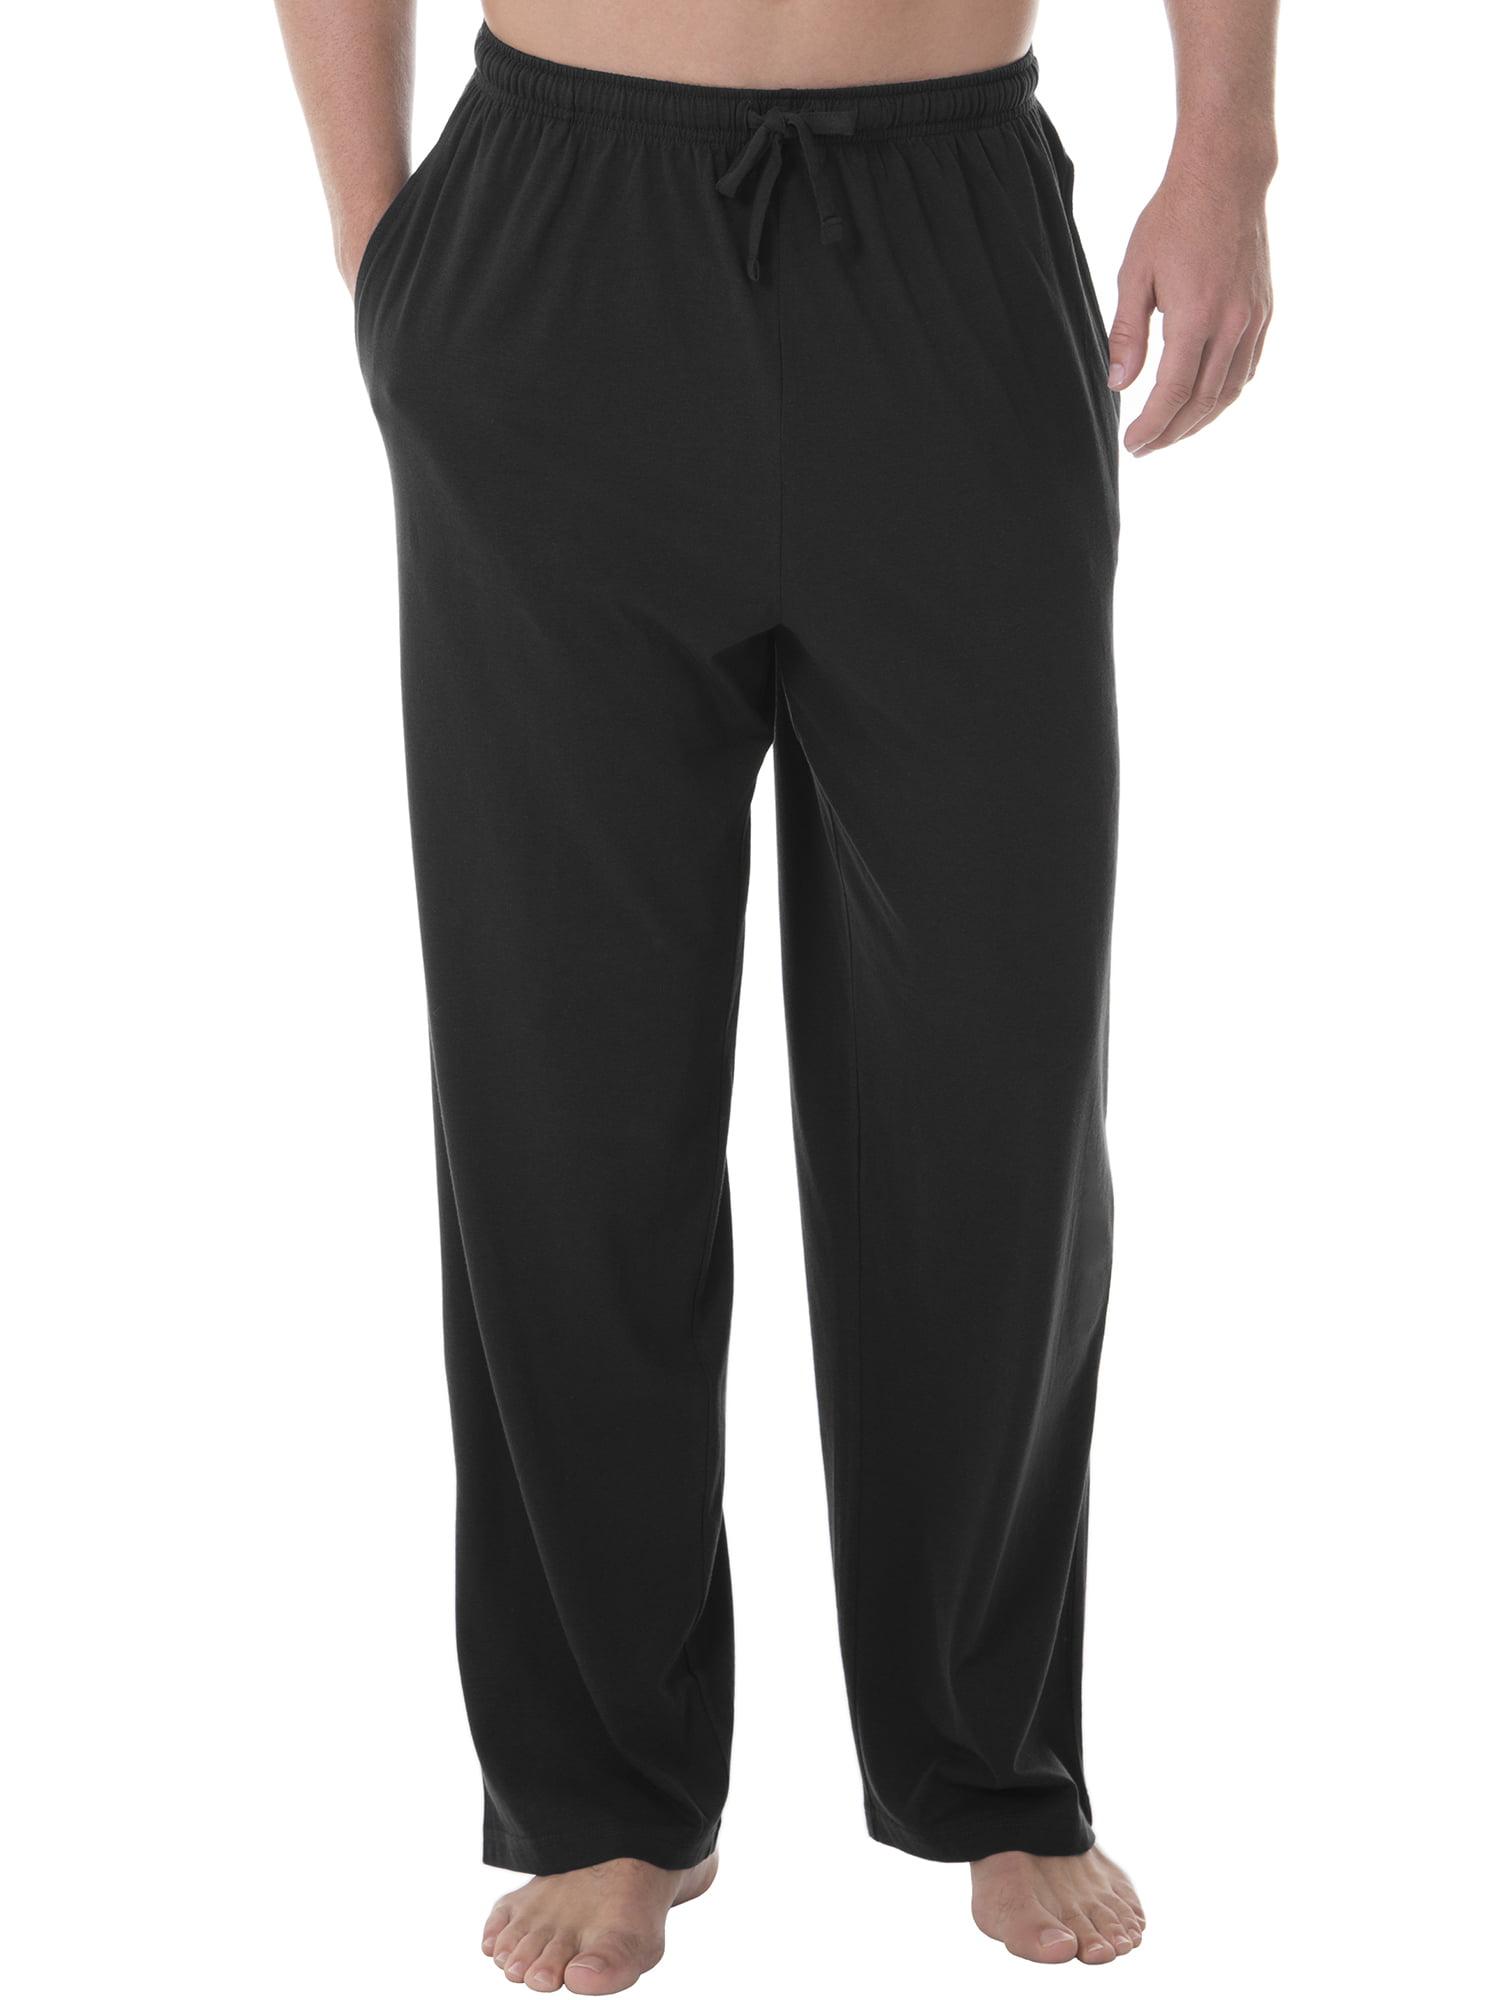 Big and Tall Men's Cotton Jersey Elastic Waist Lounge Pants